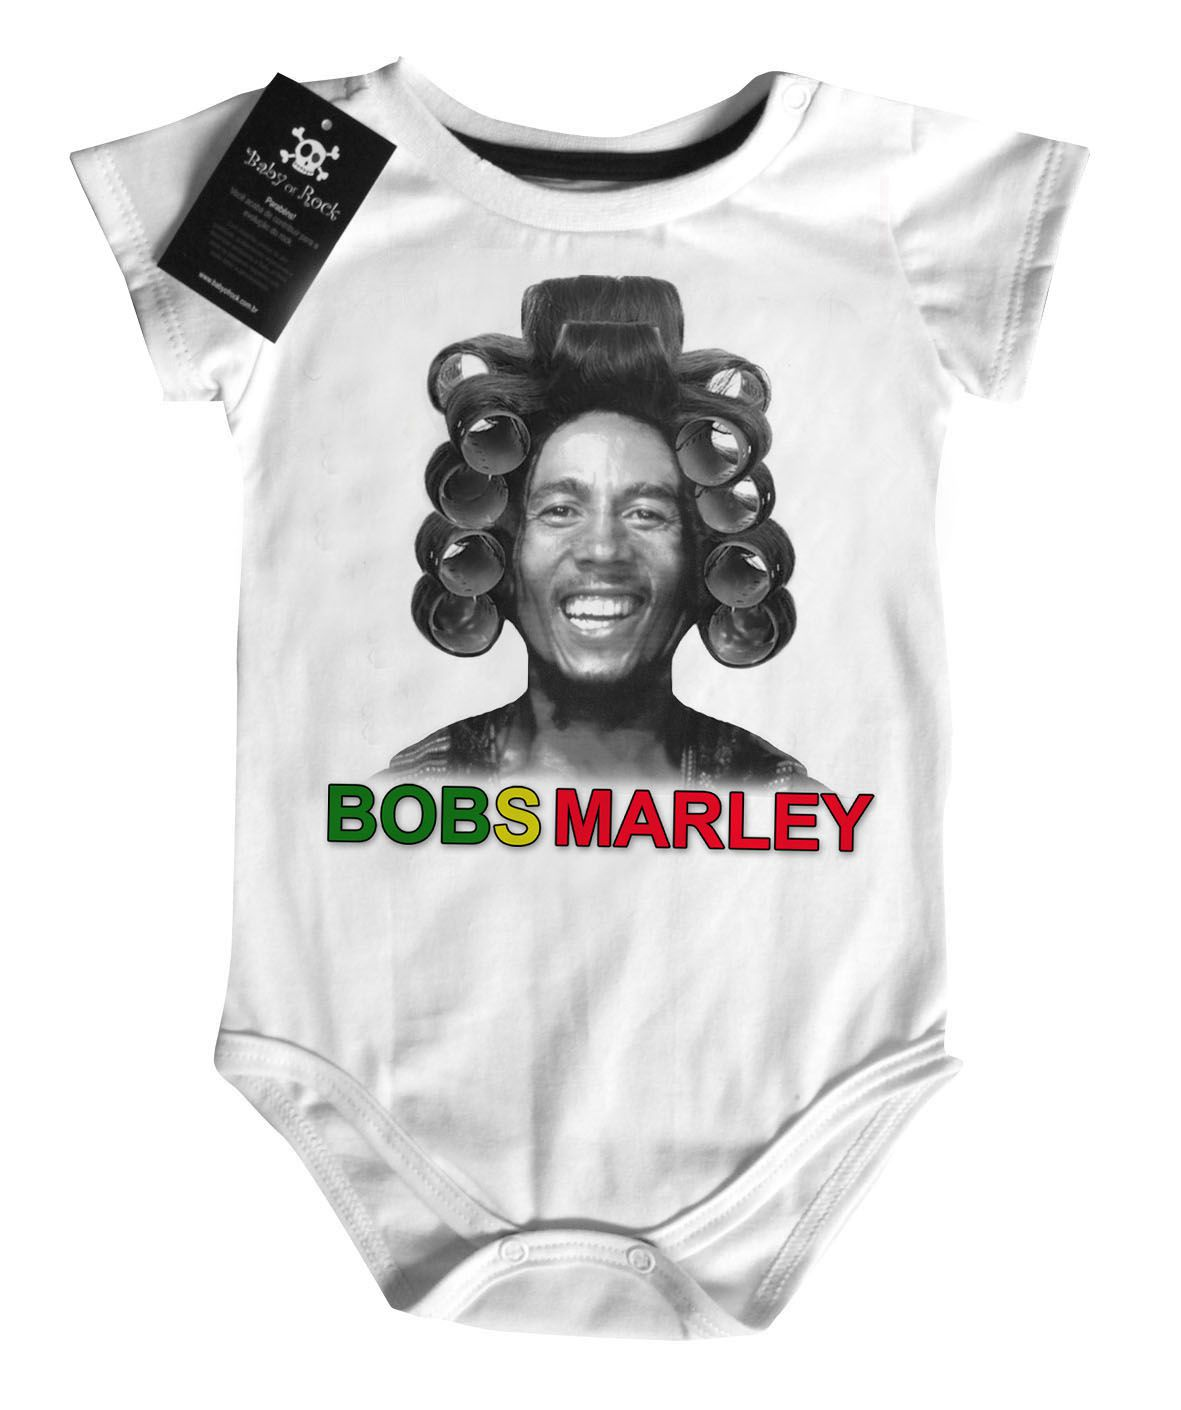 Body Bebê | Bobs Marley | white  - Baby Monster - Body Bebe